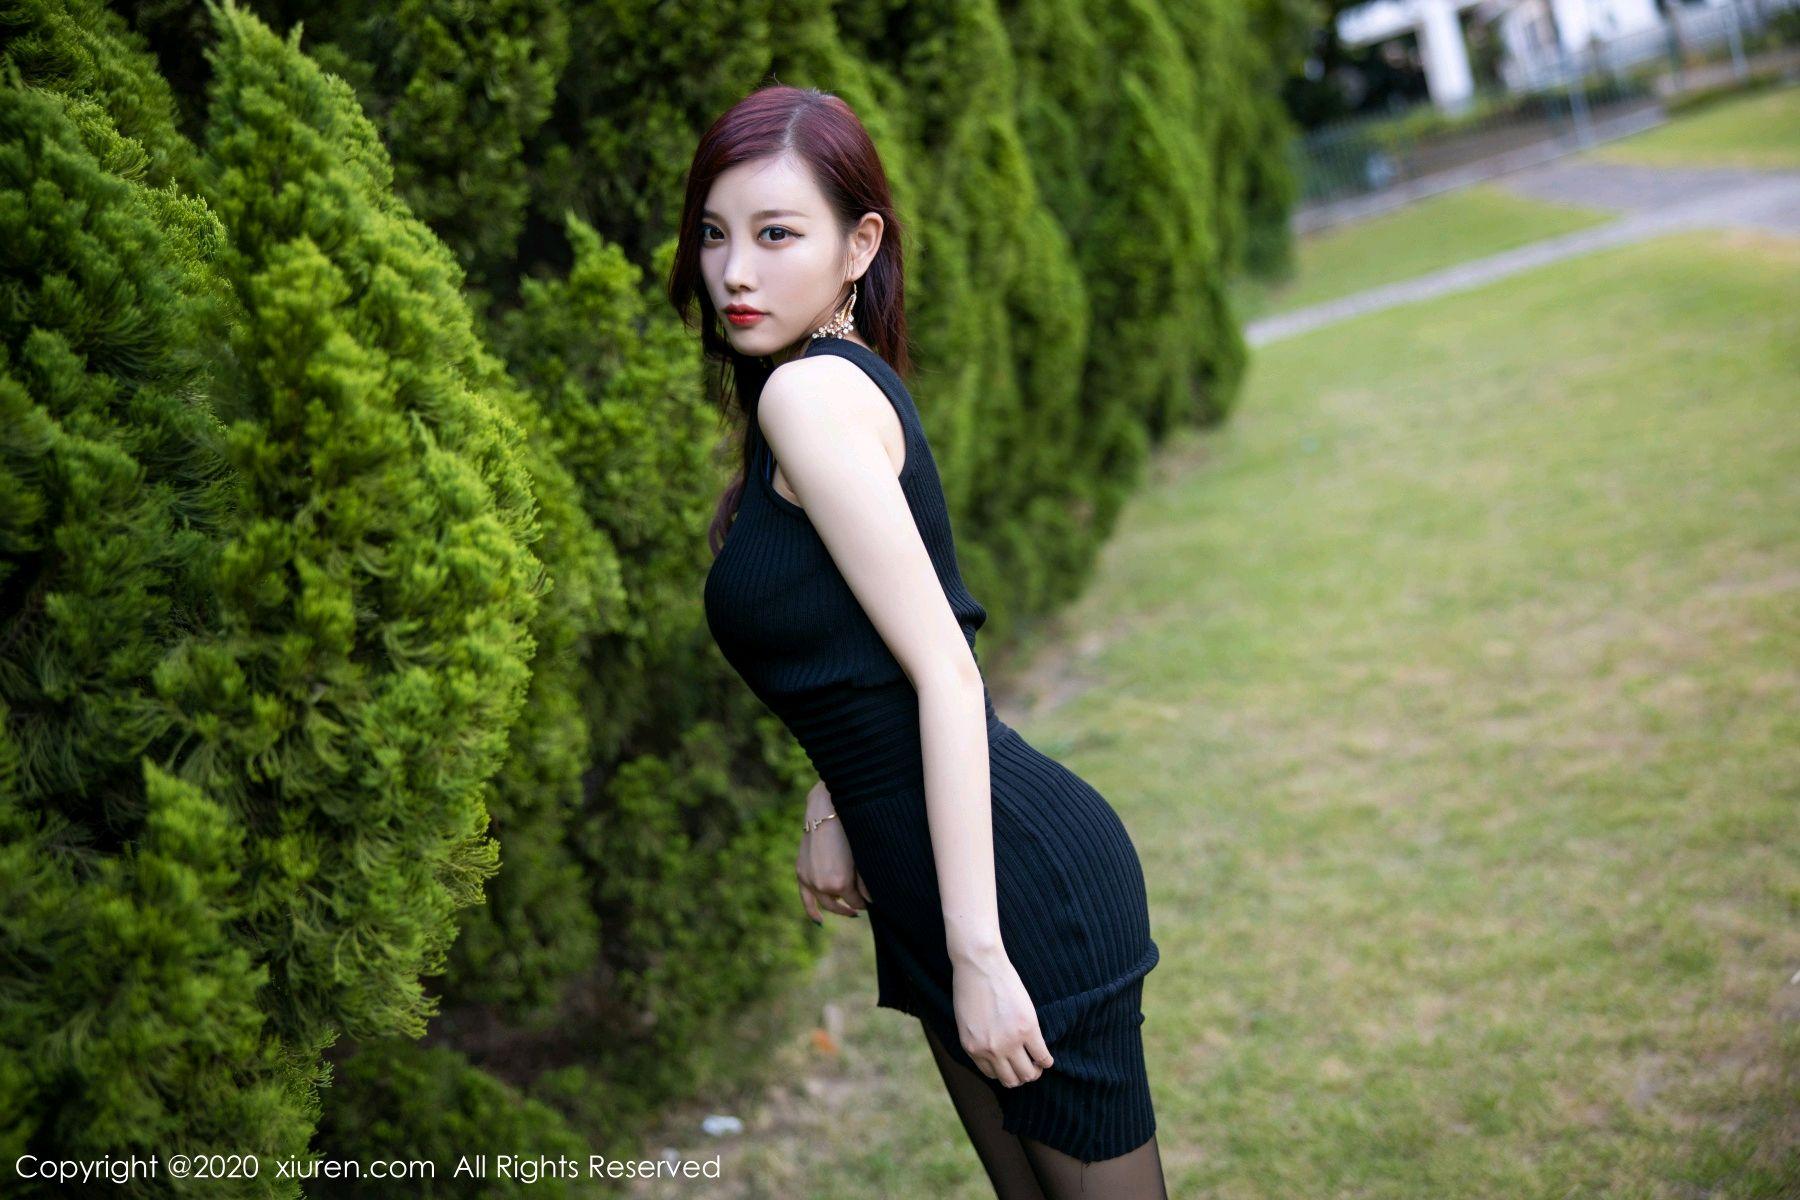 [XiuRen] Vol.2648 Yang Chen Chen 37P, Black Silk, Outdoor, Xiuren, Yang Chen Chen